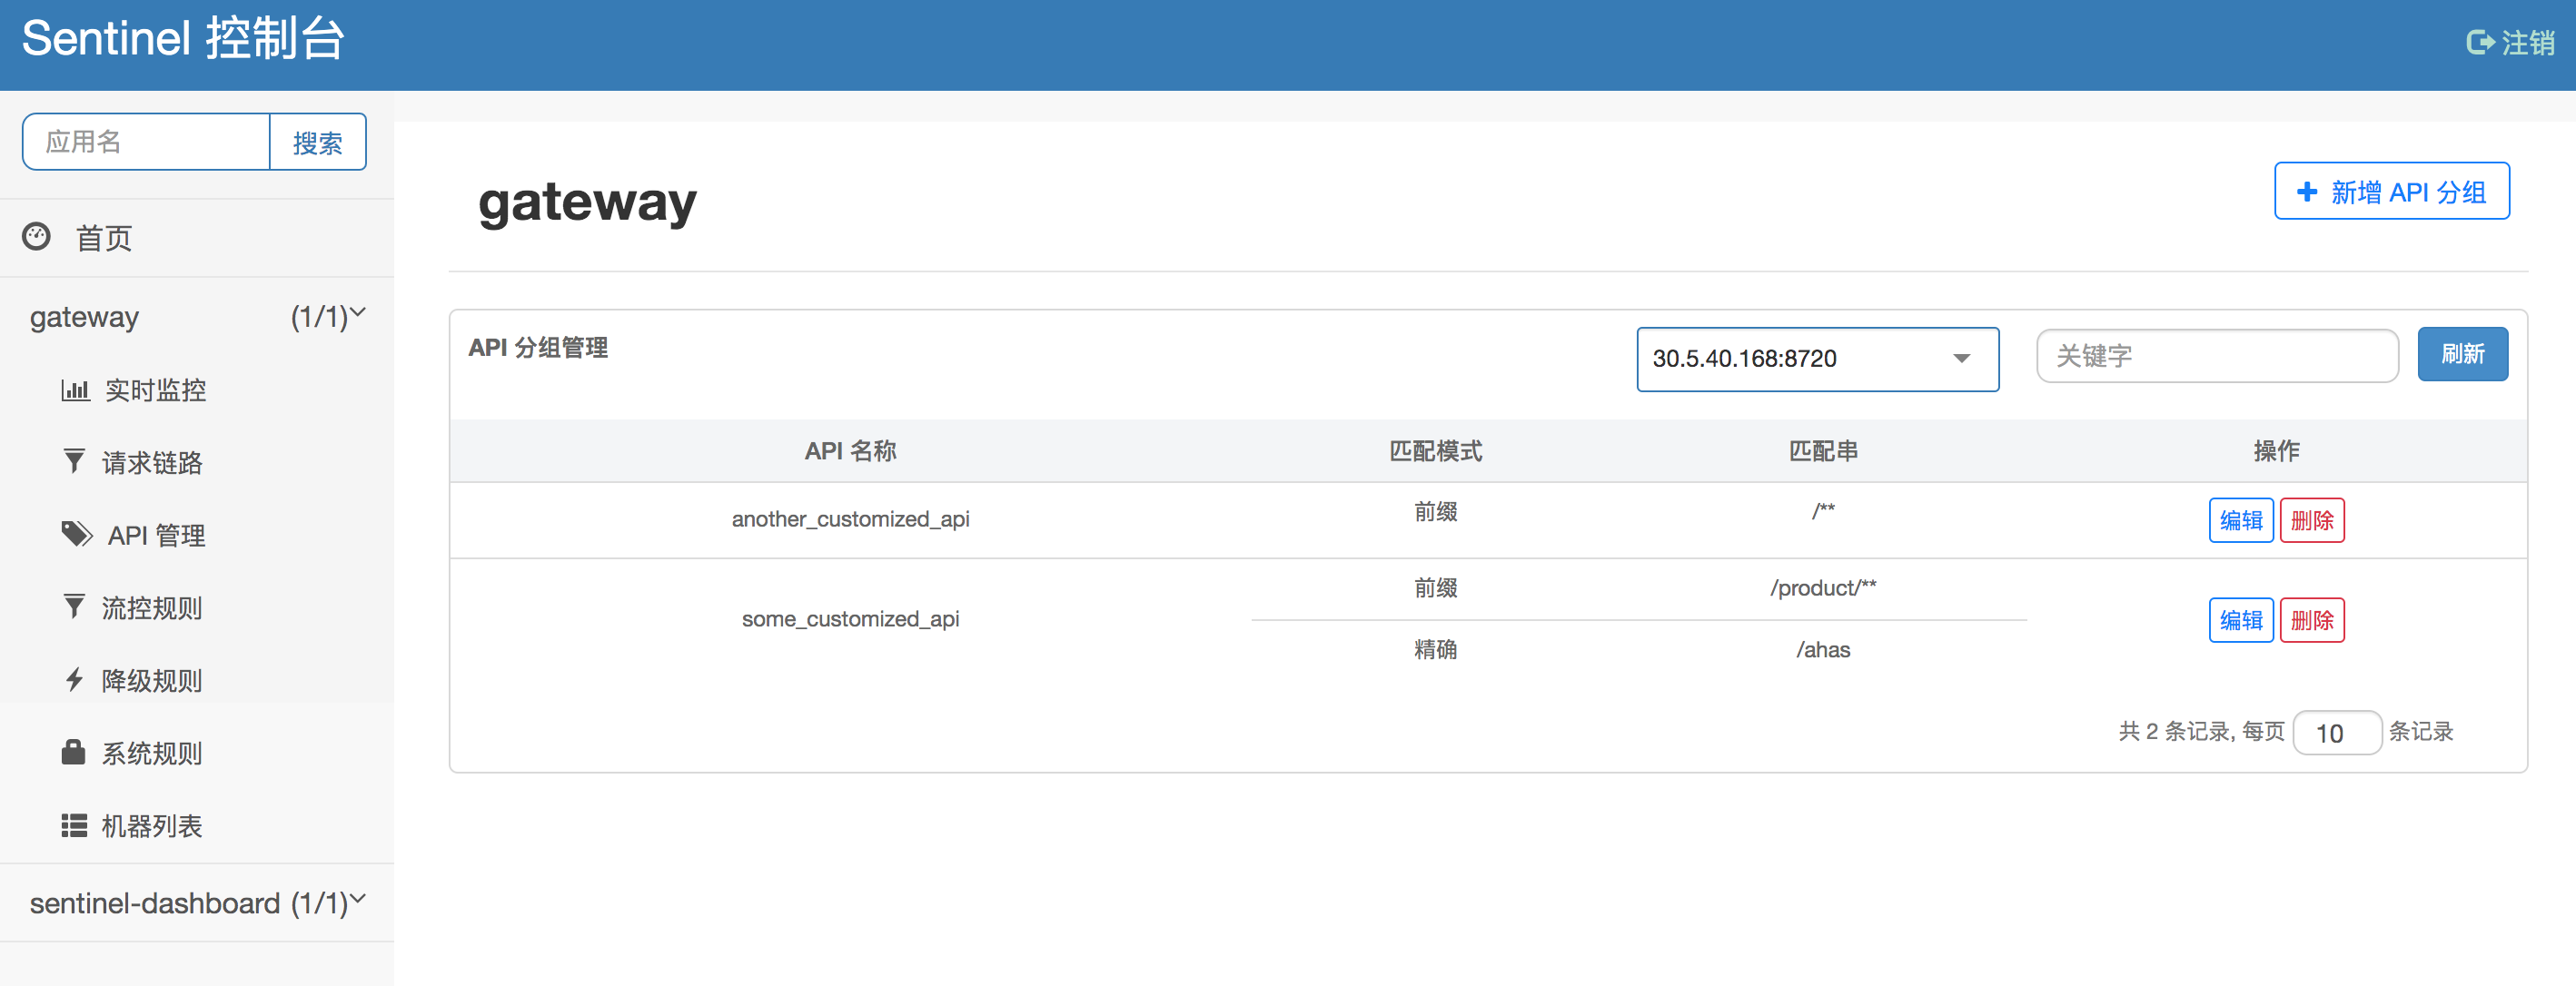 sentinel-dashboard-api-gateway-customized-api-group